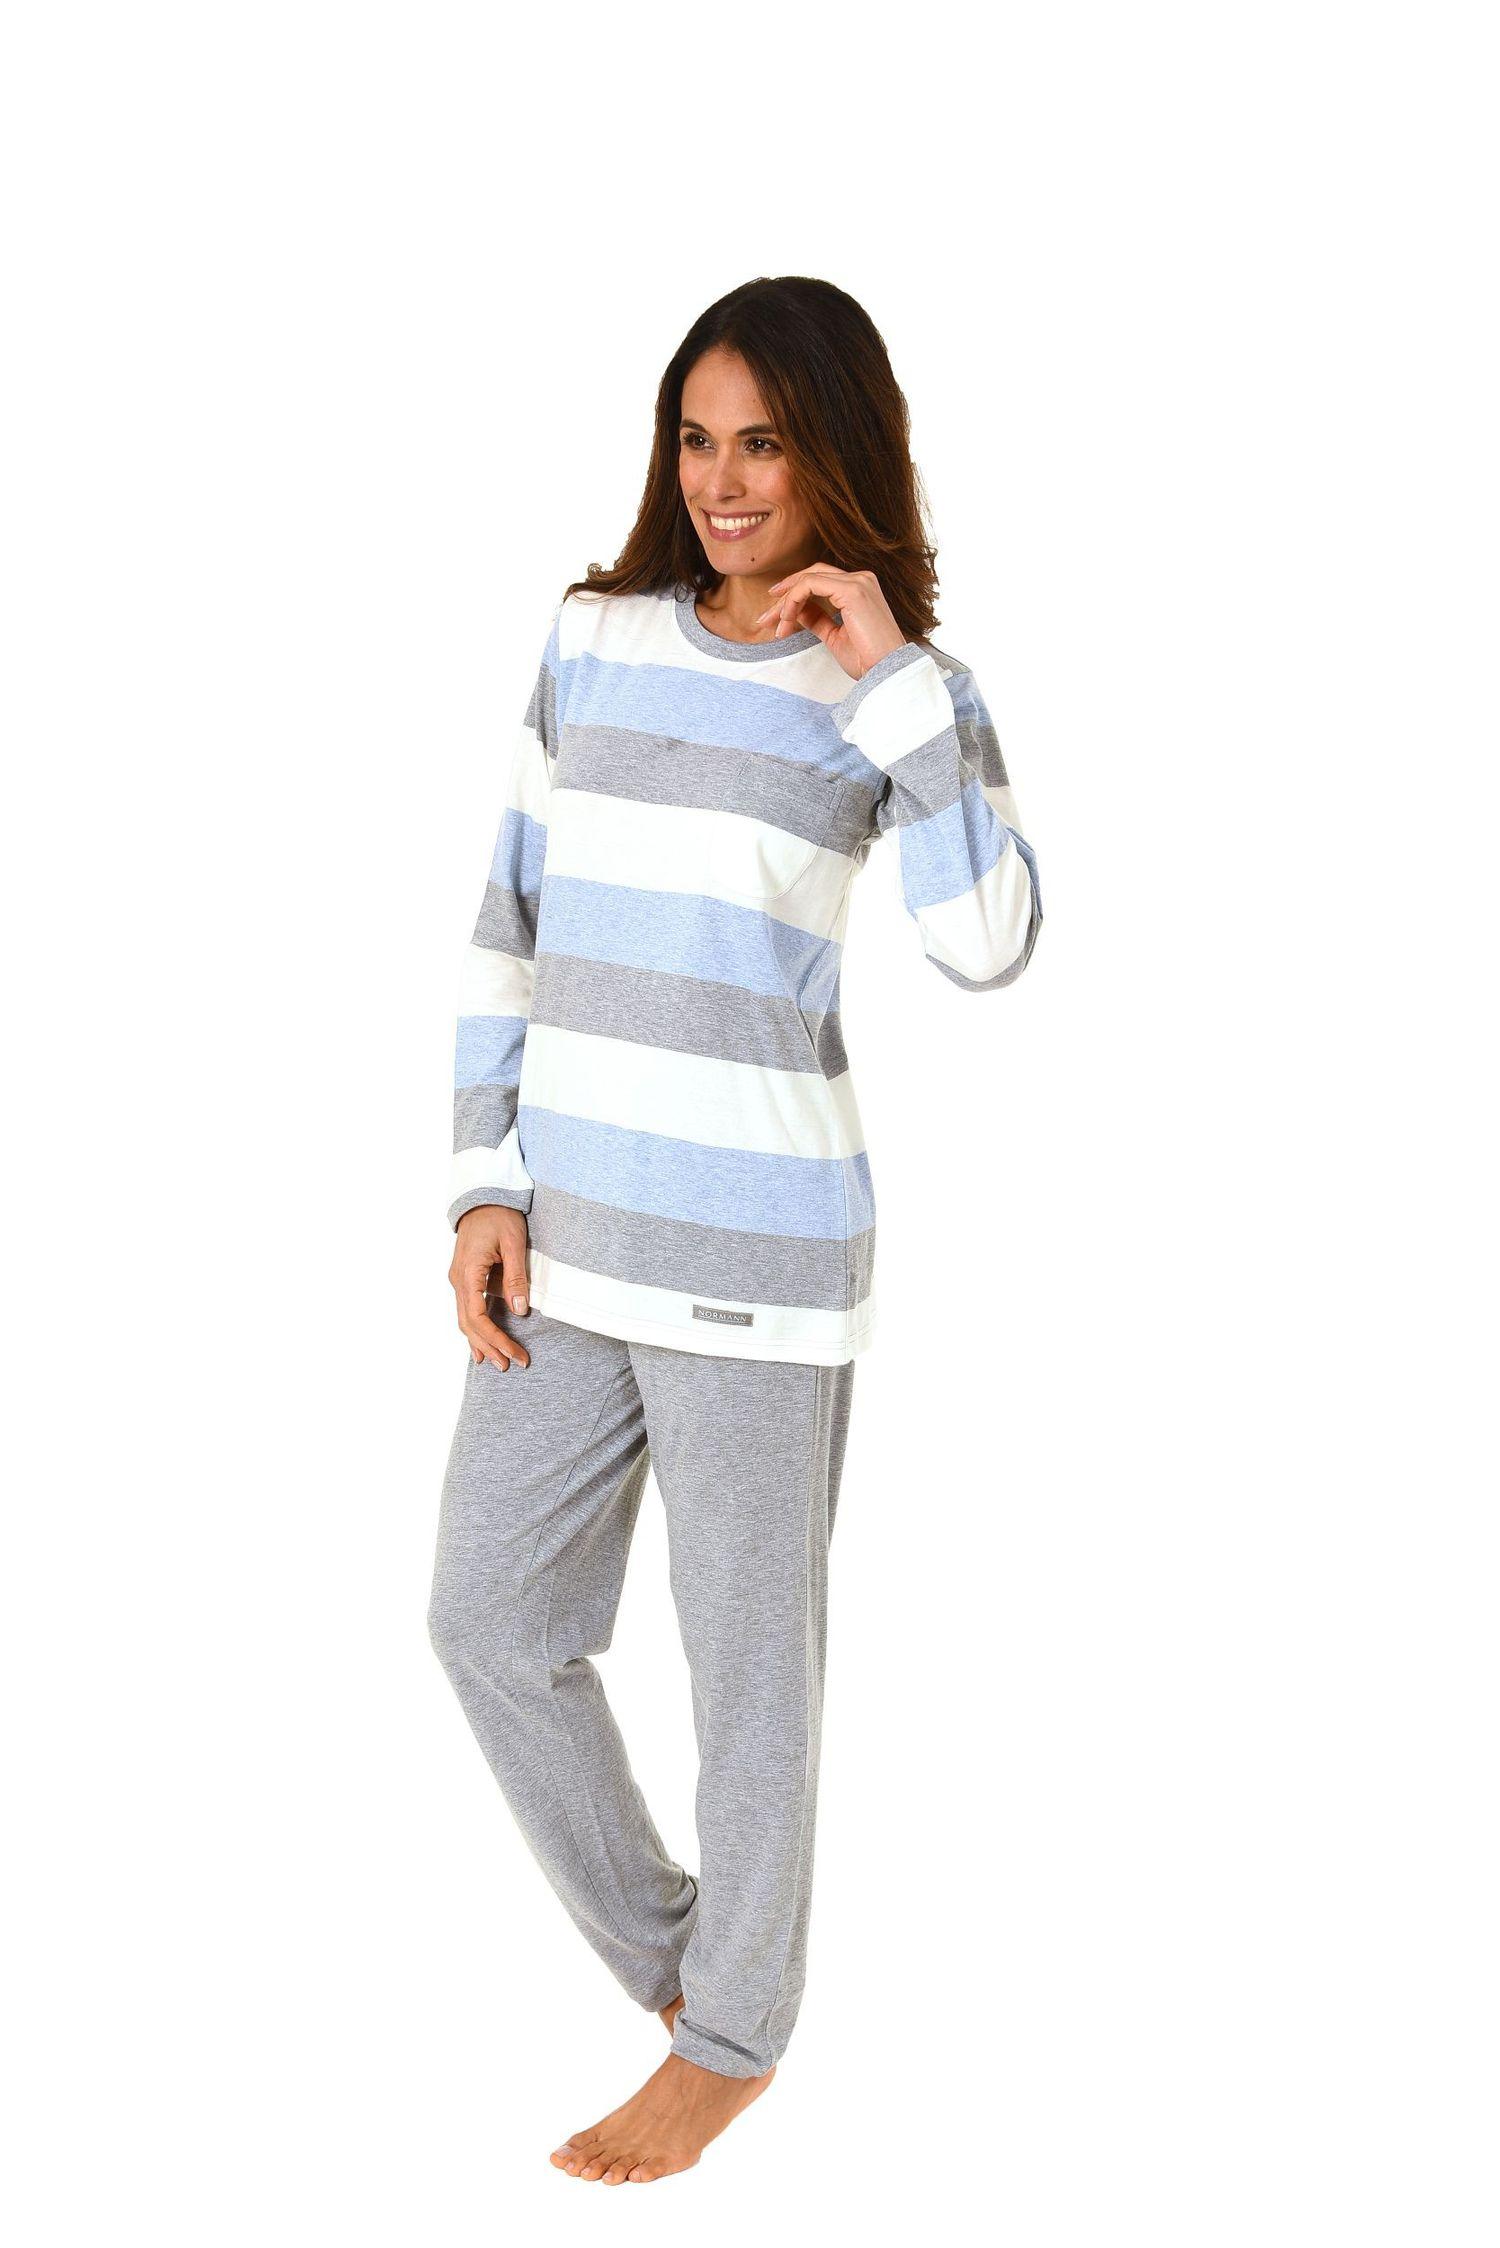 Toller Damen Pyjama  langarm in wunderschöner Block Streifen Optik – 271 201 90 101 001